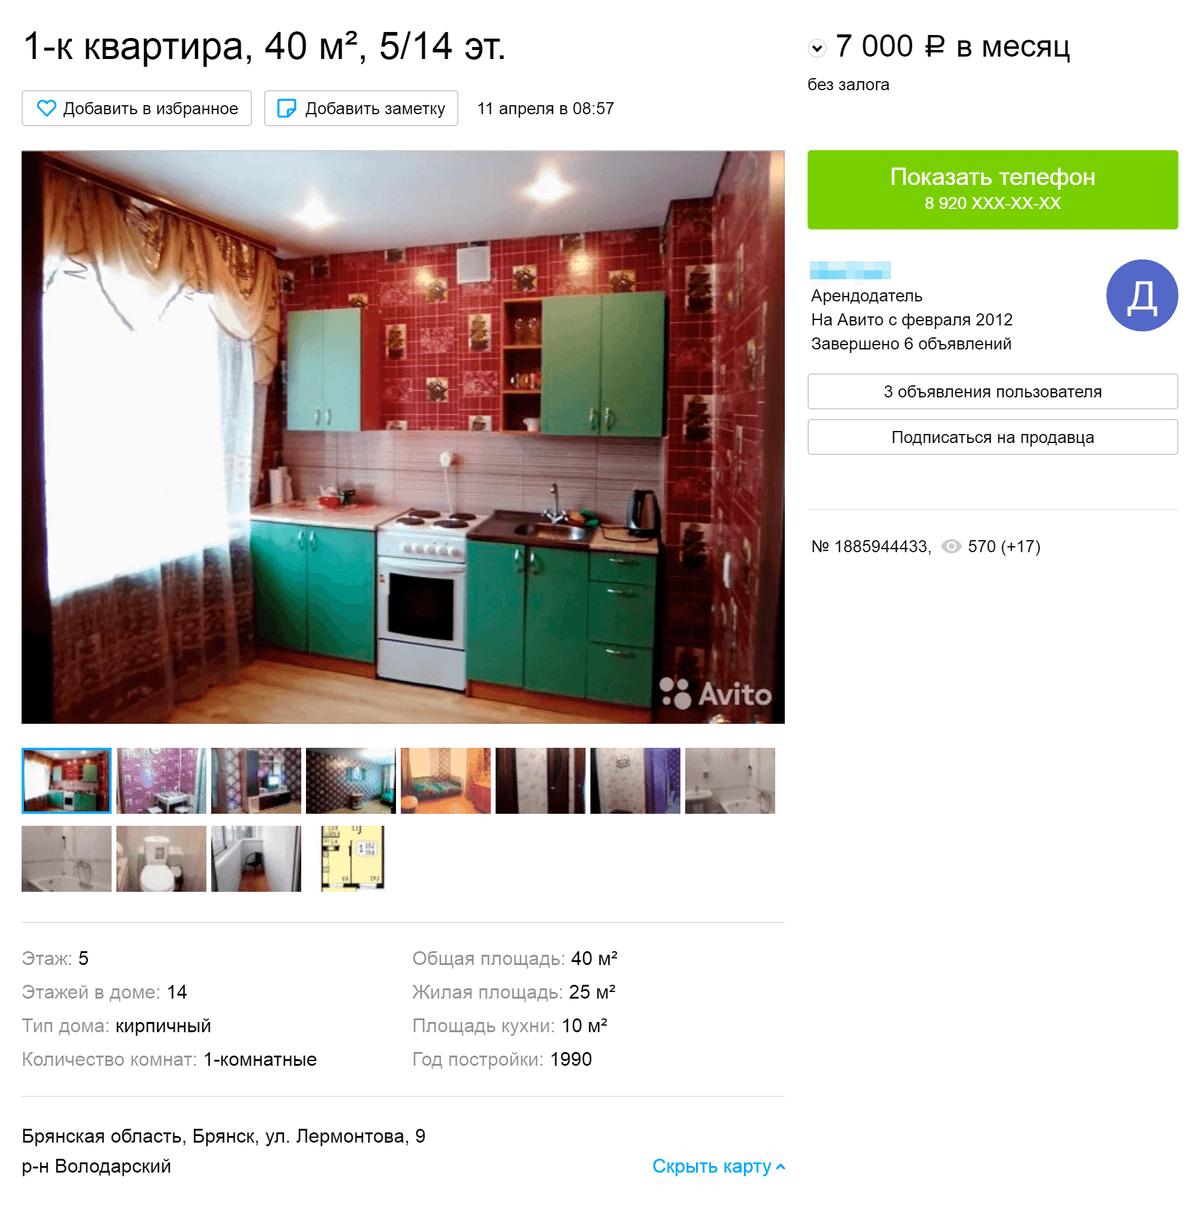 Снять квартиру в Володарском районе недалеко от вокзала можно за 7000<span class=ruble>Р</span> в месяц